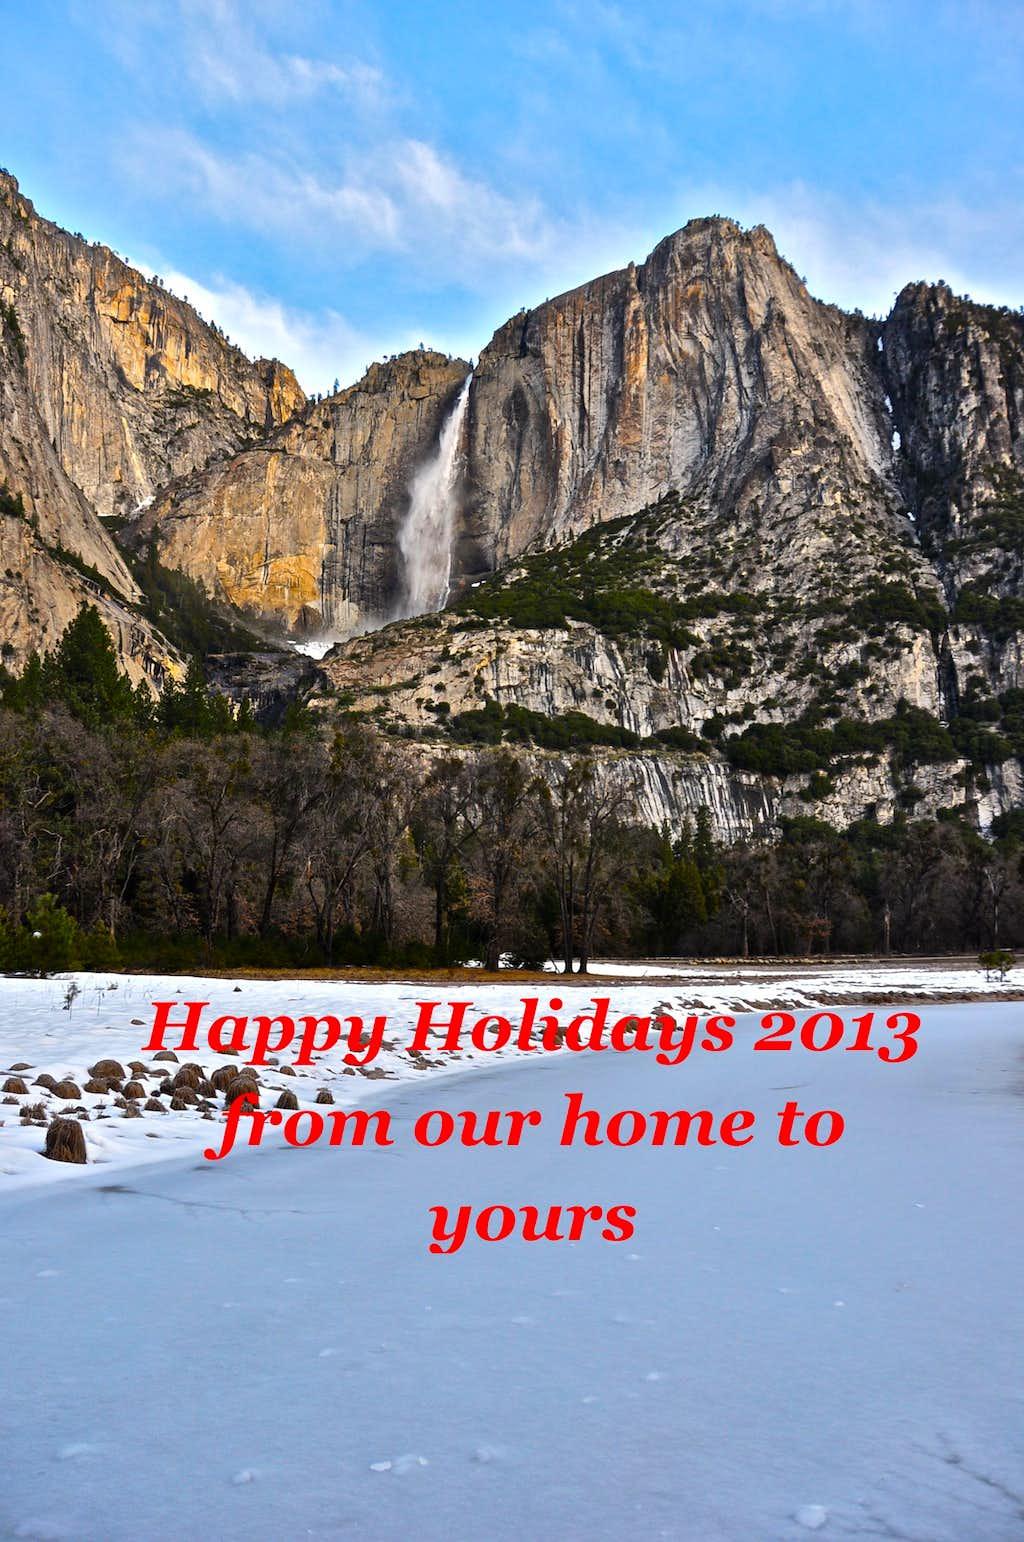 Holiday Greetings 2013